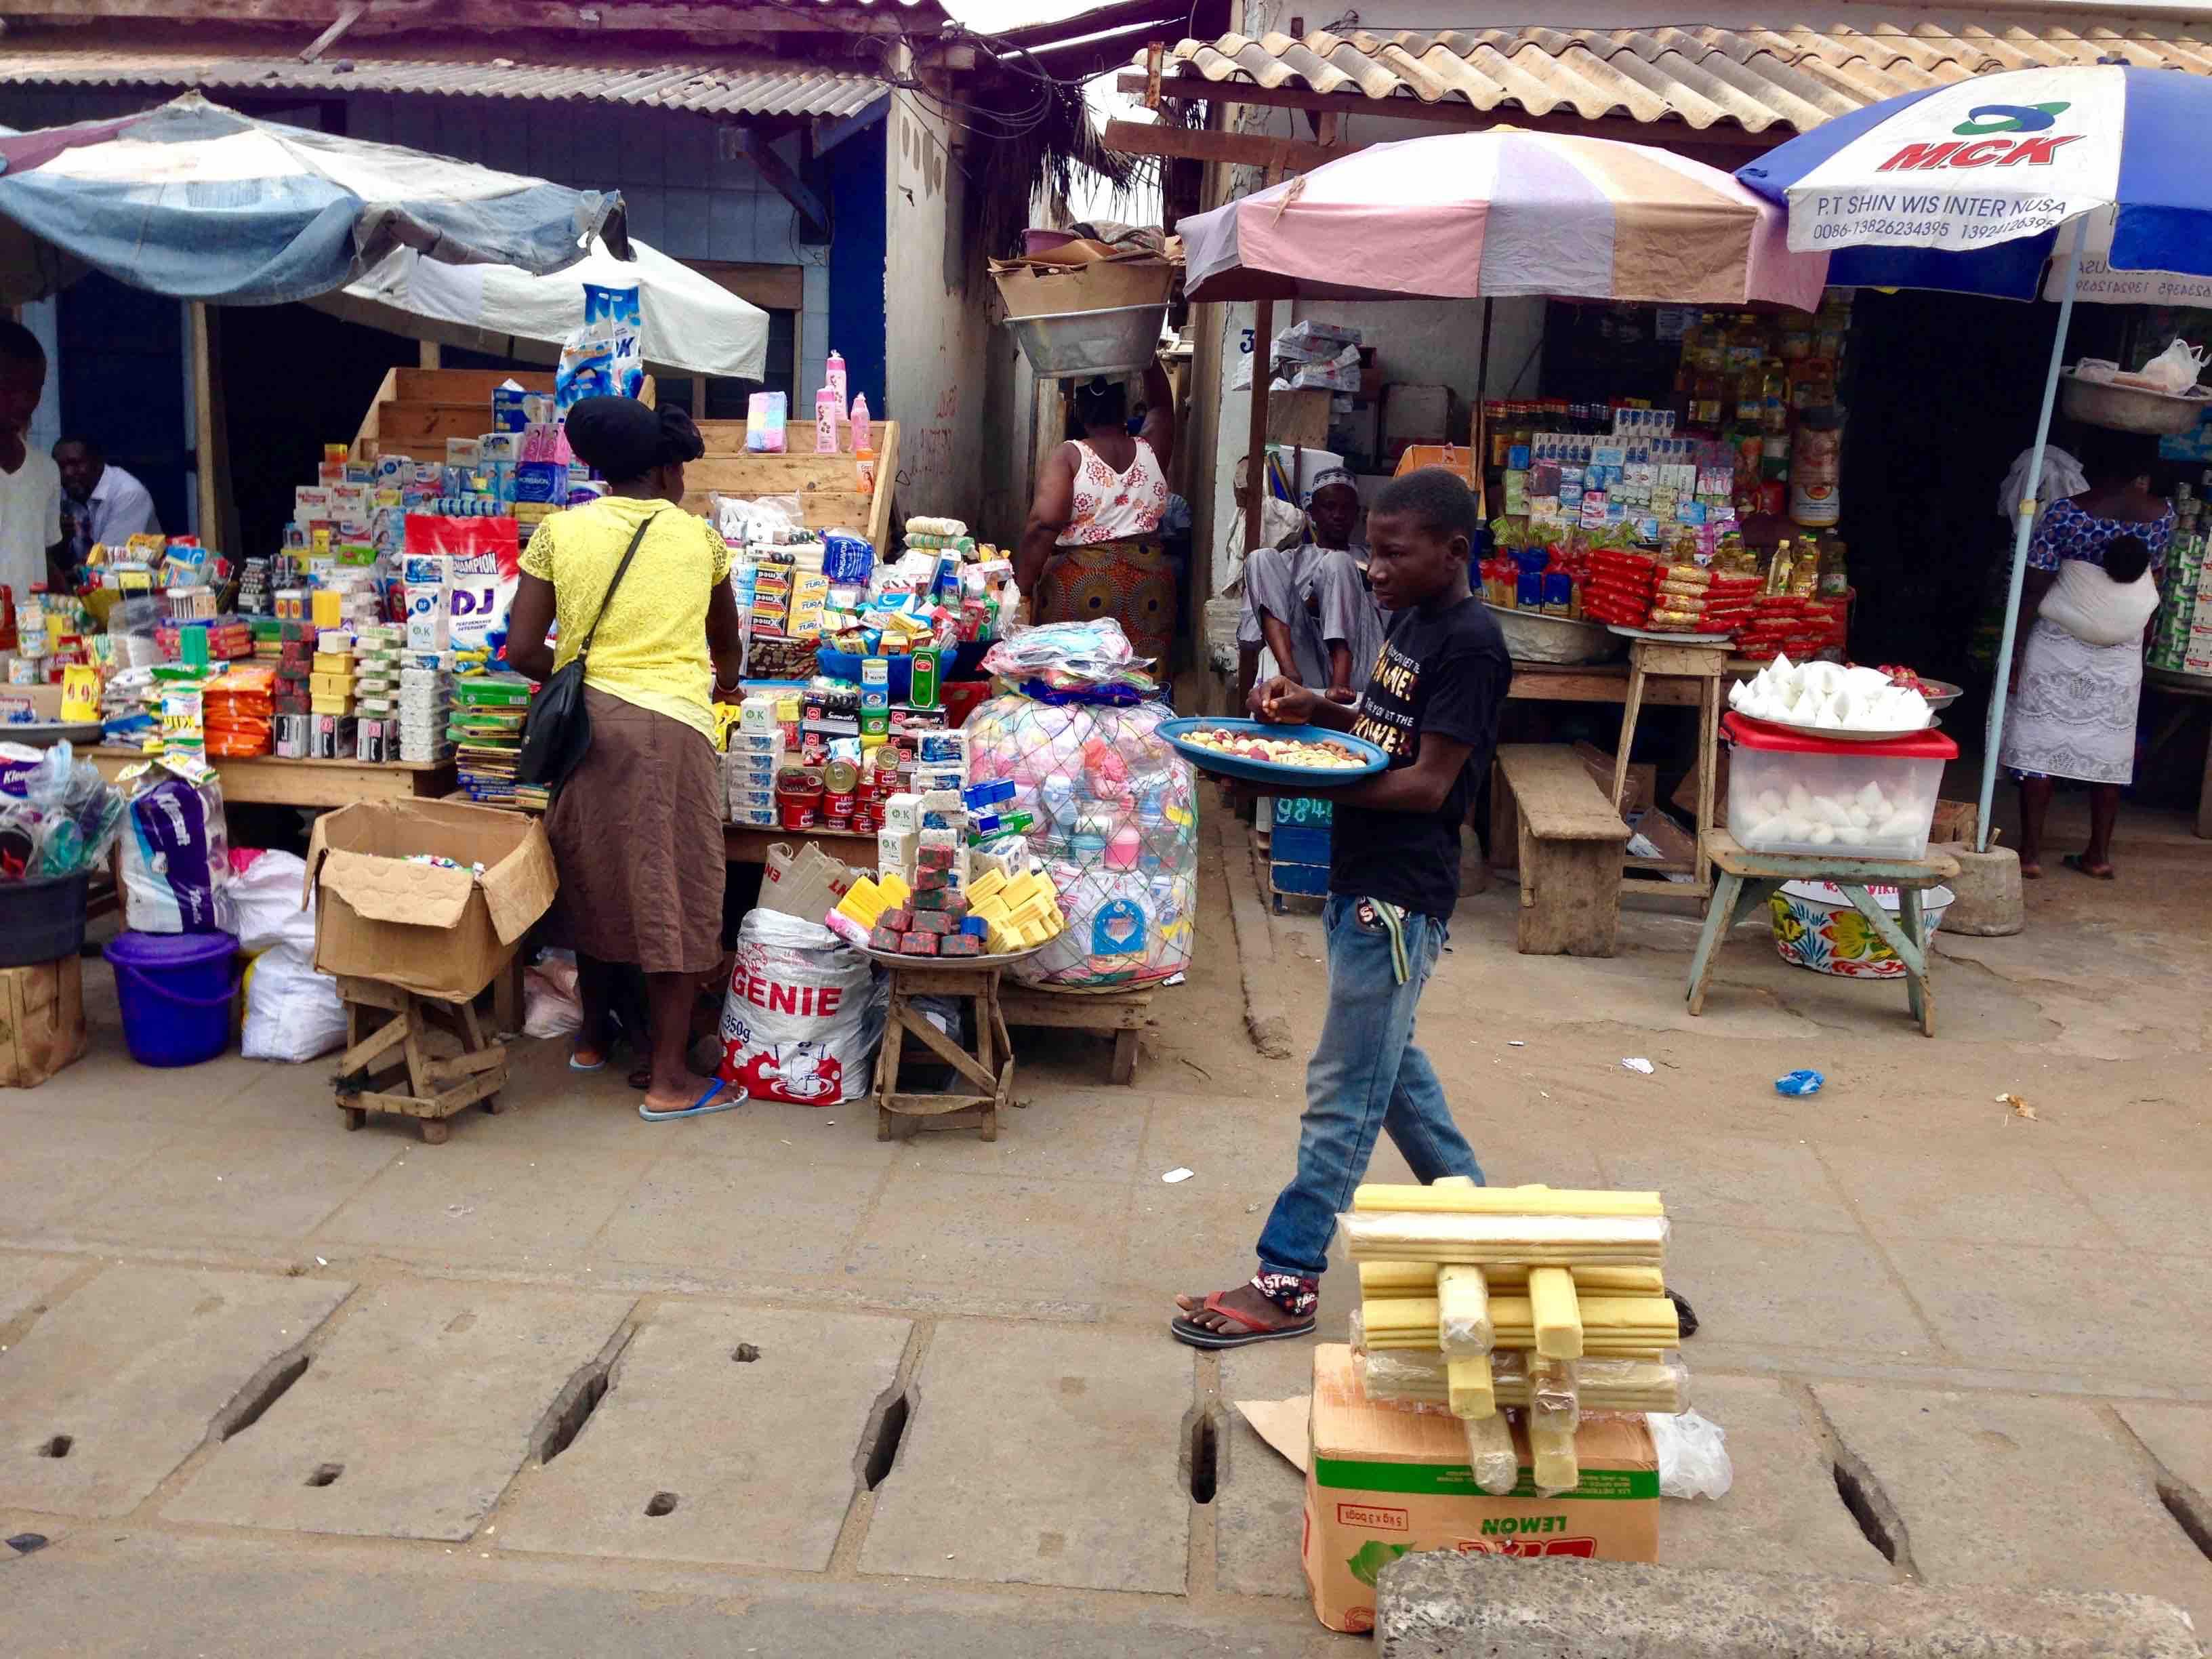 Street Market Scene, Route d'Aflao, Lome, Togo. #JujuFilms